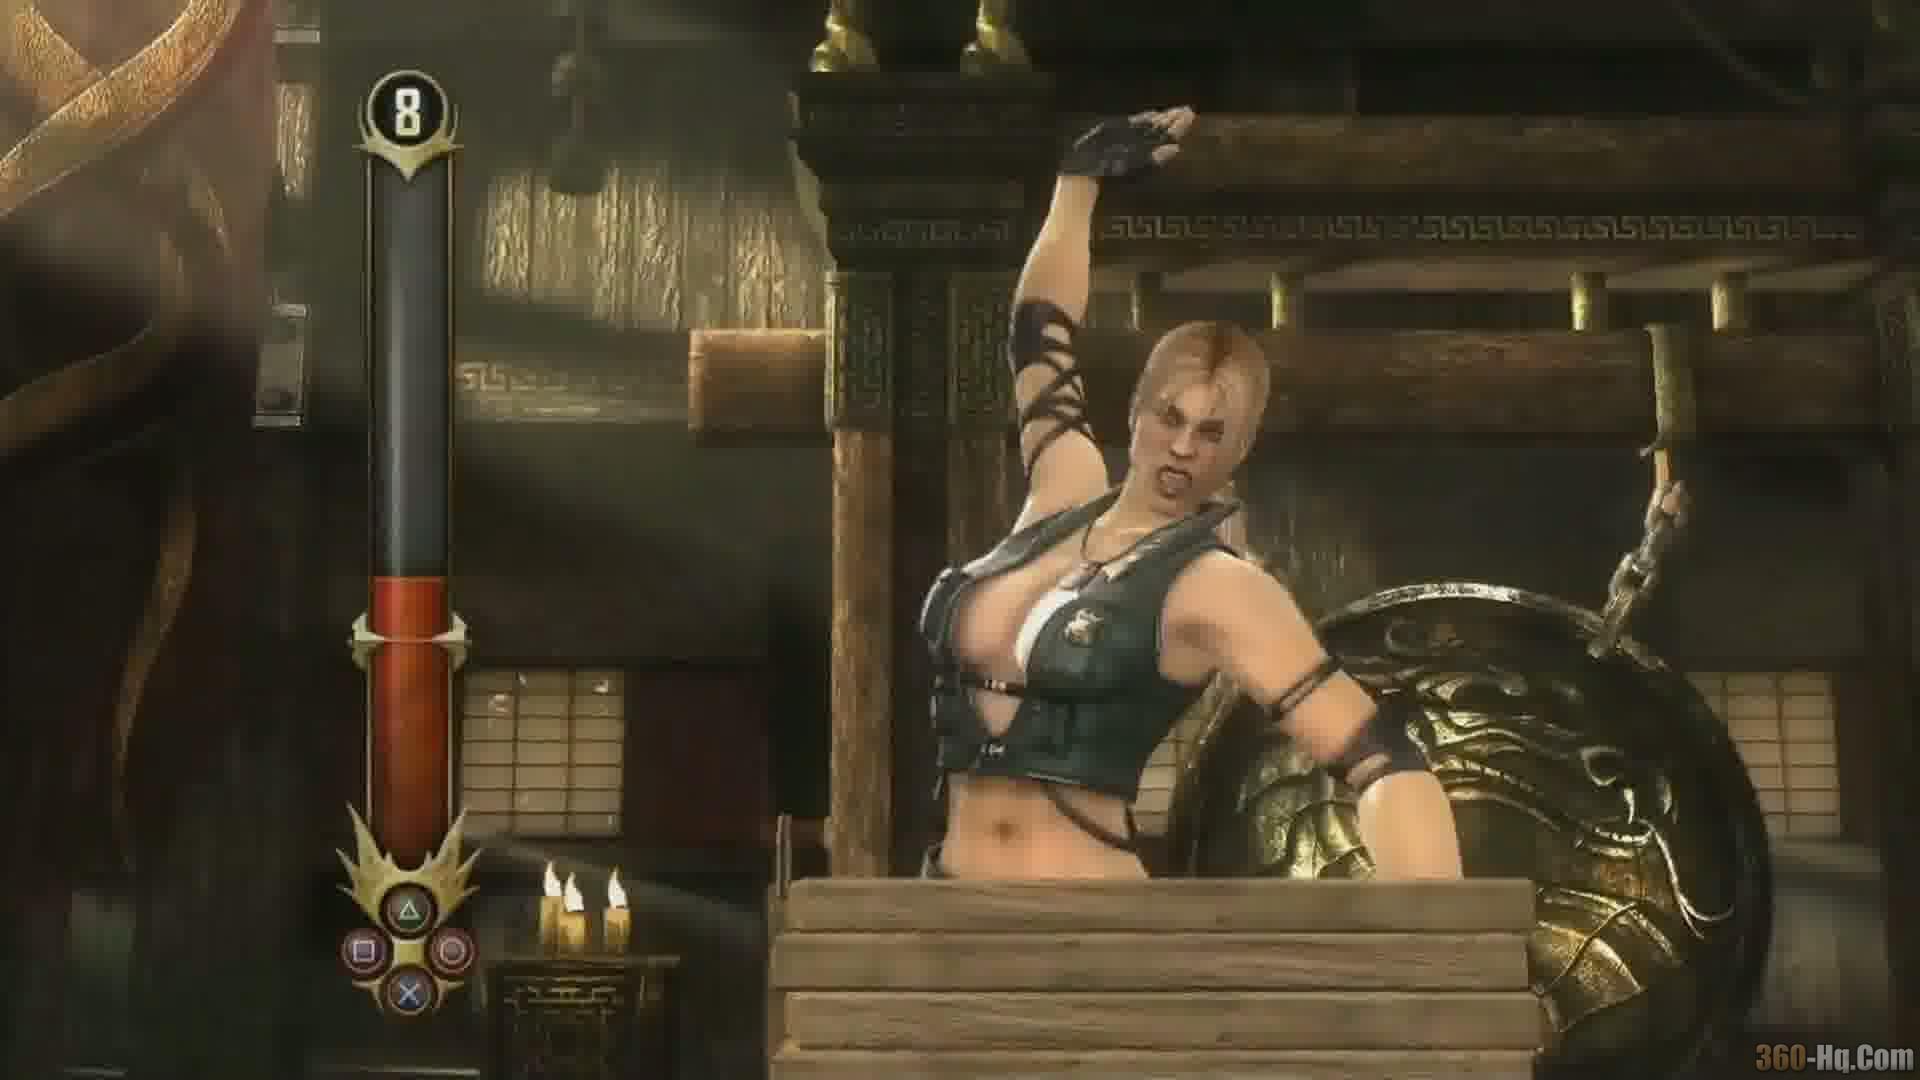 Mortal kombat komplete edition nud patc porn download